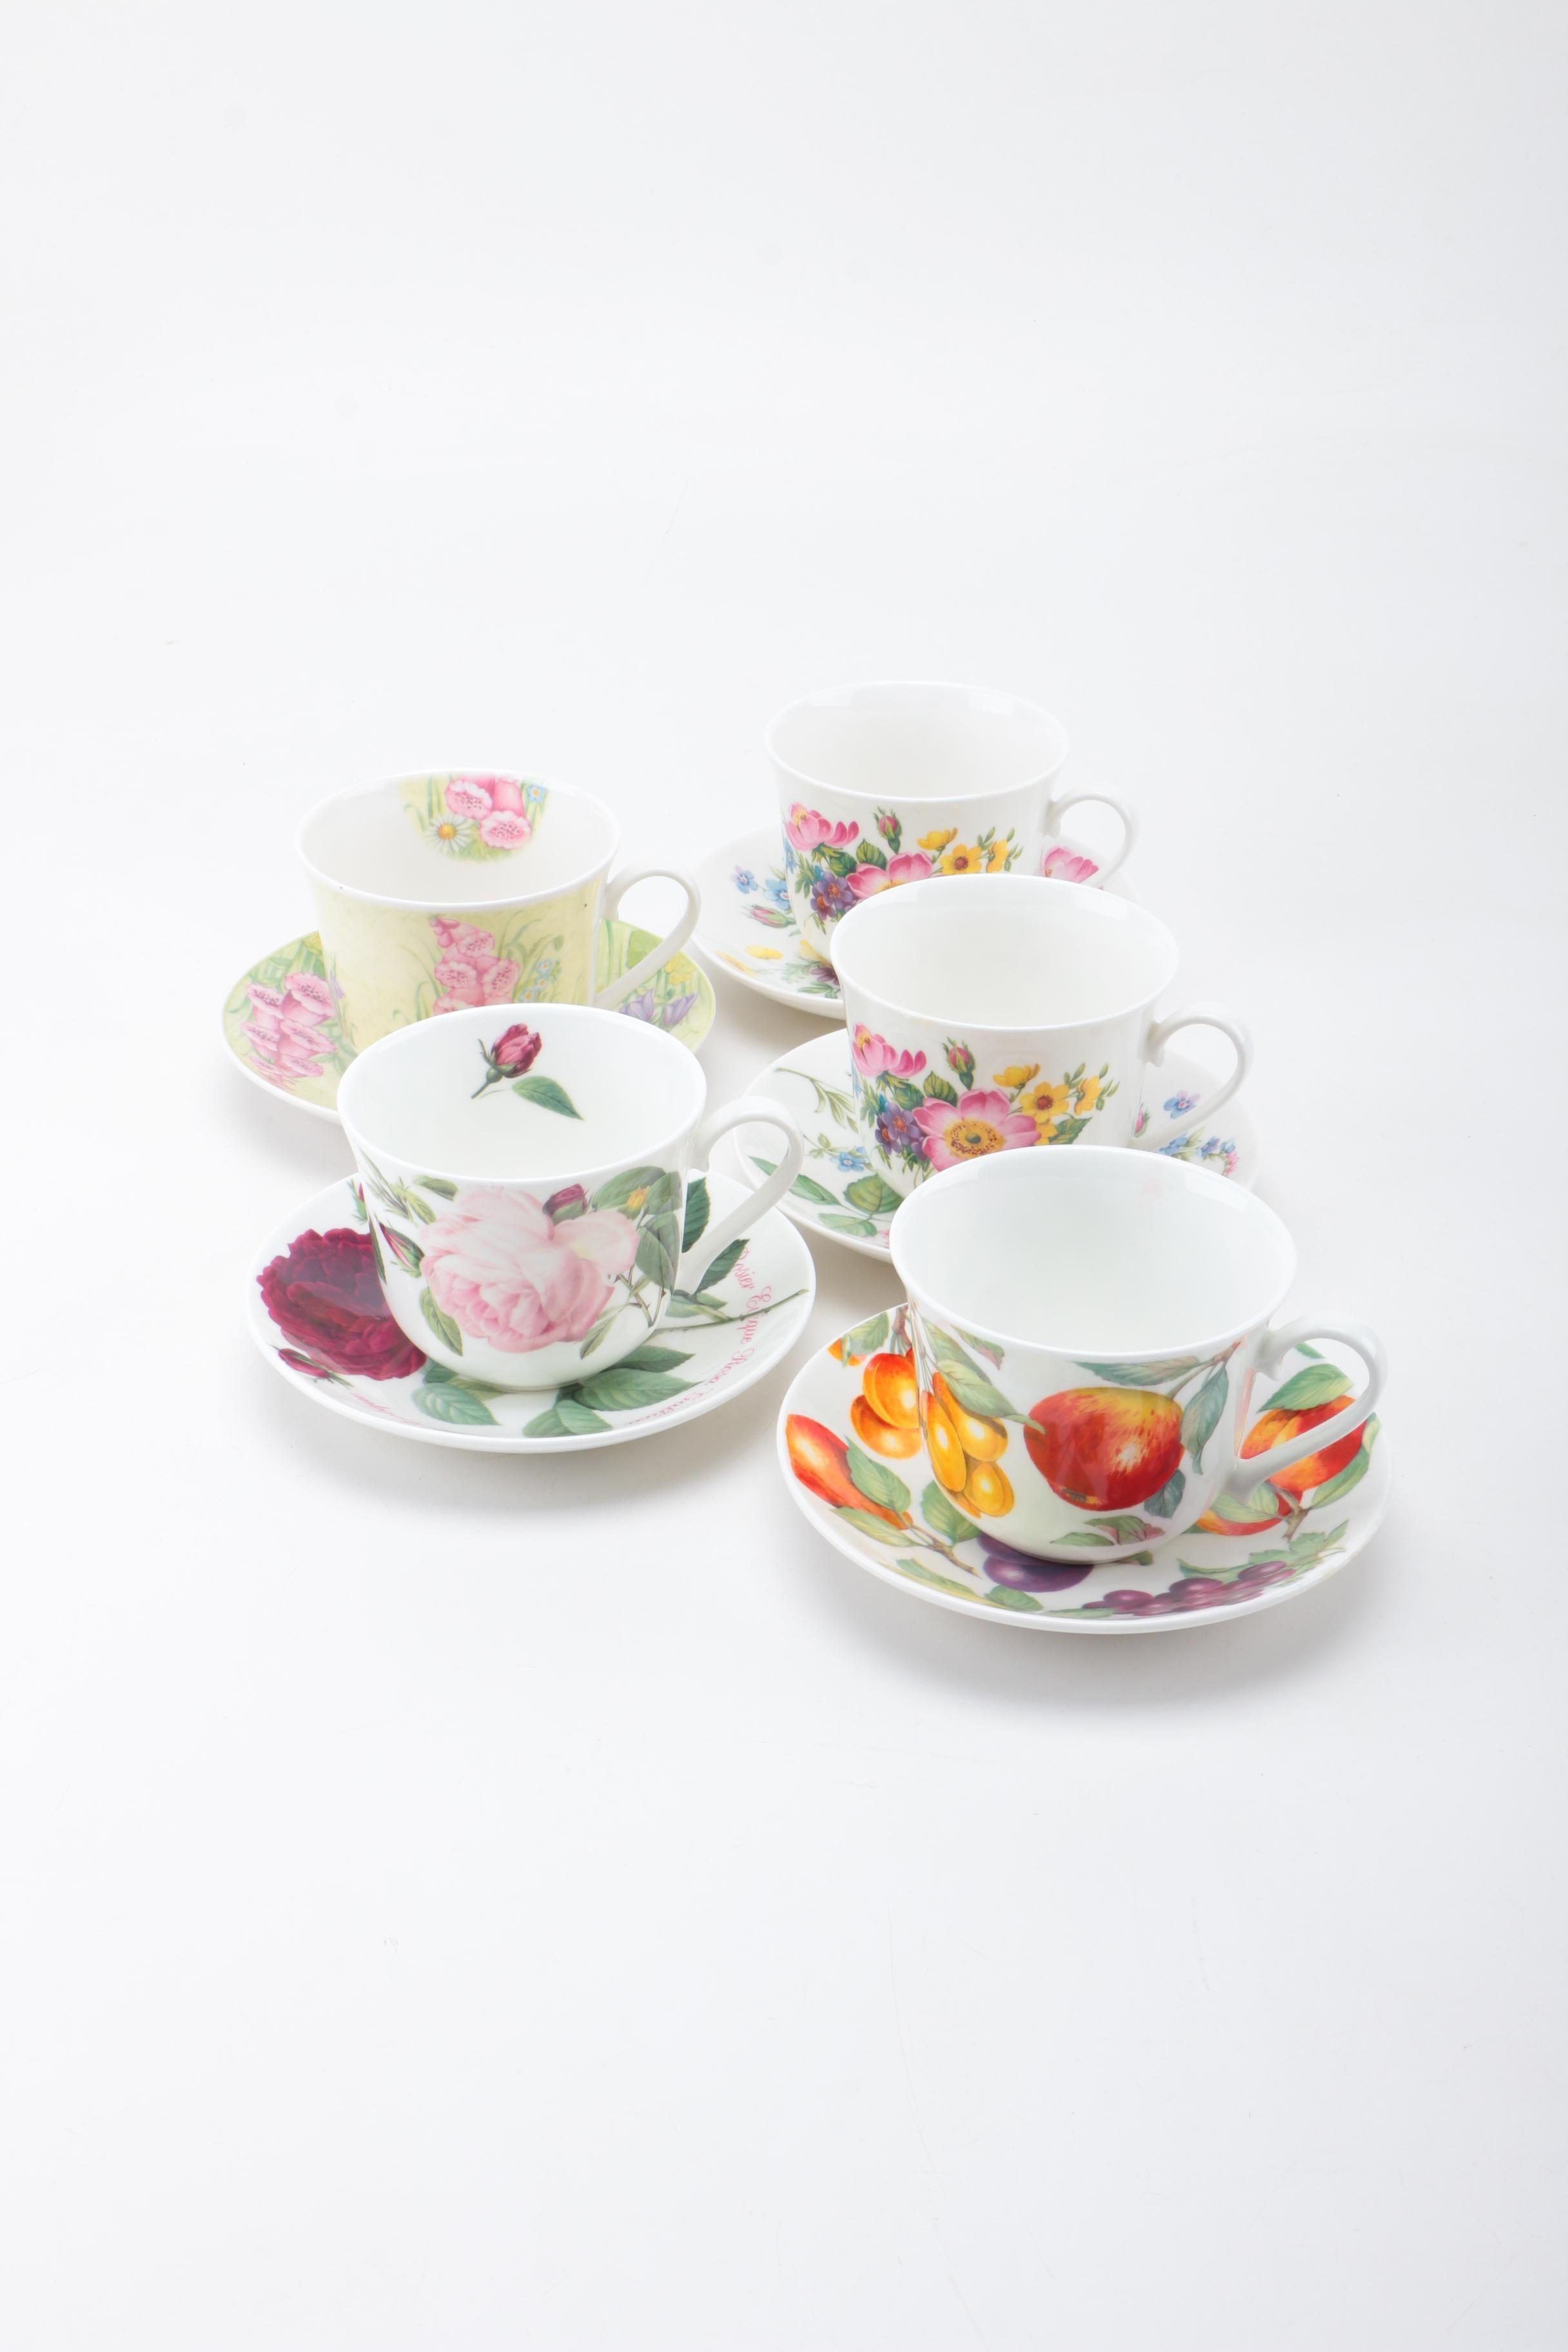 Elegance and Roy Kirkham China Teacups and Saucers